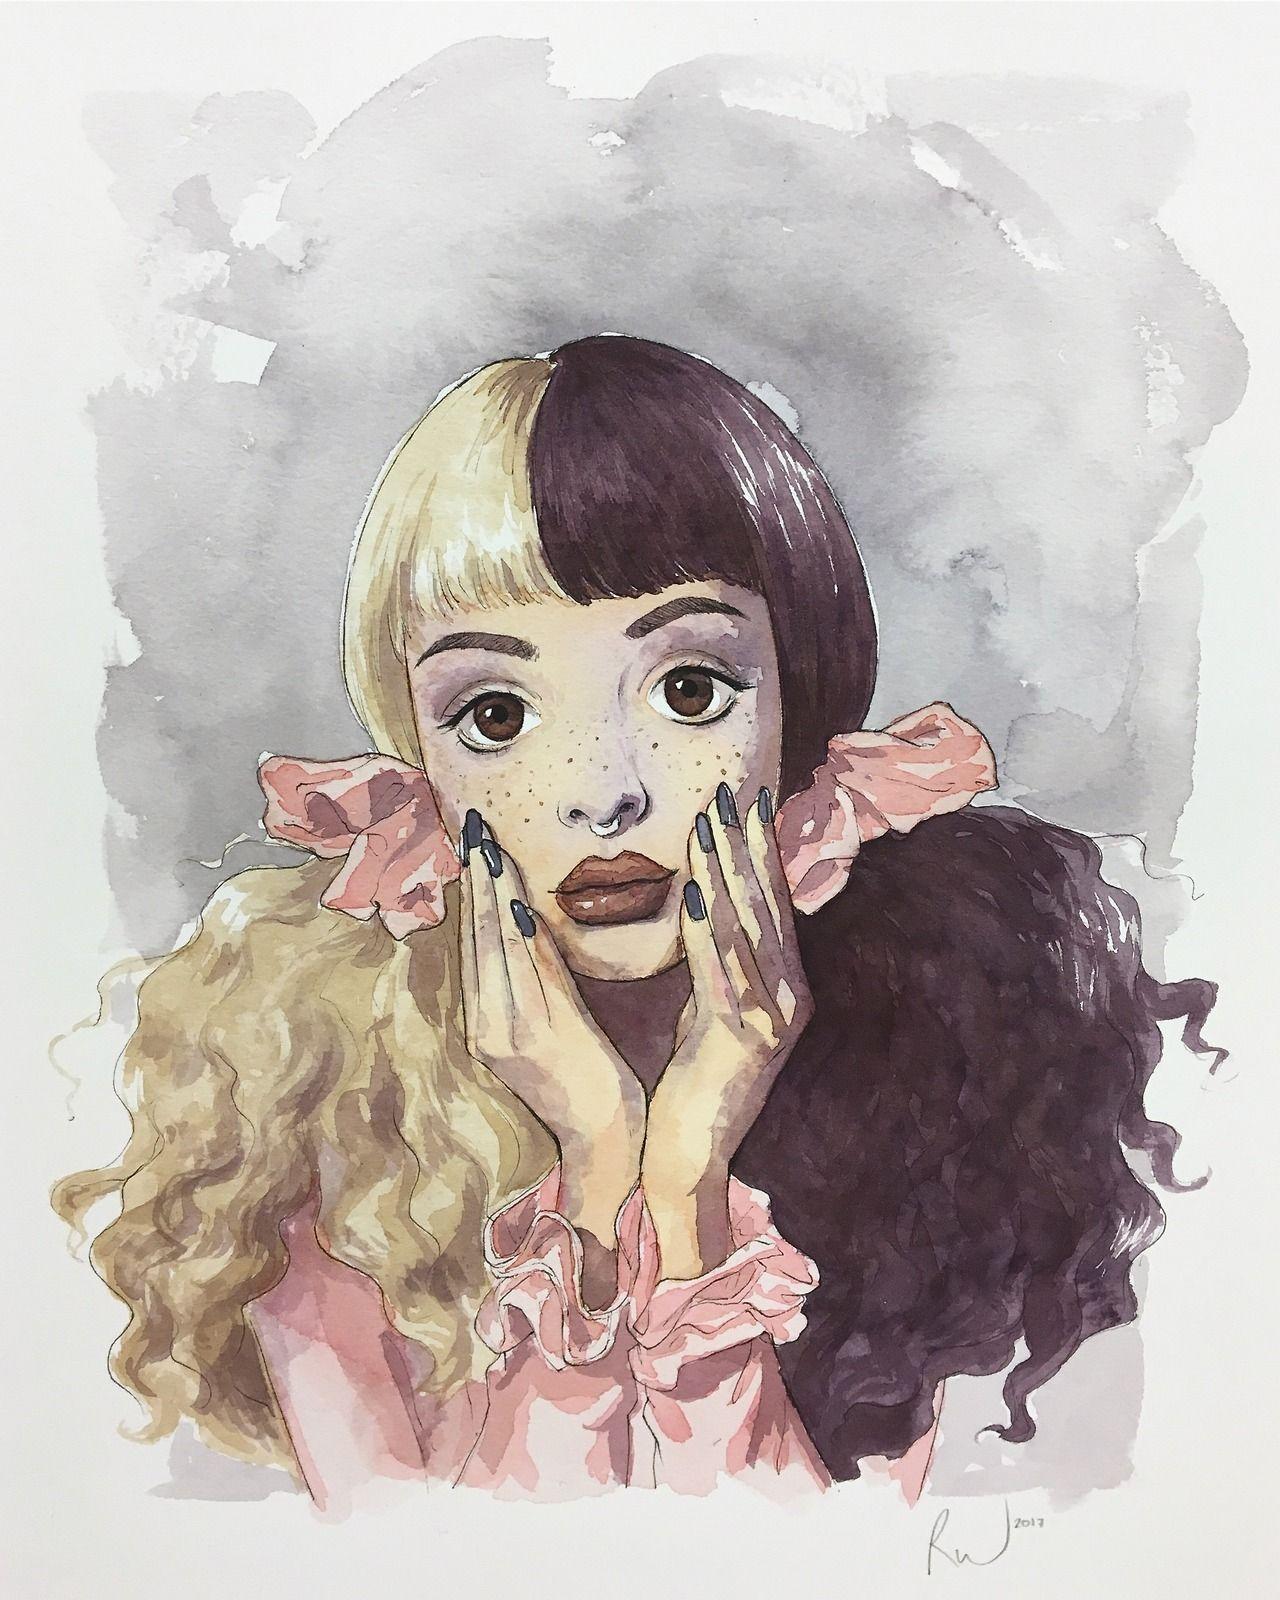 Pinterest Nonameisadora Valeriaamyoni Creditos Ao Autor